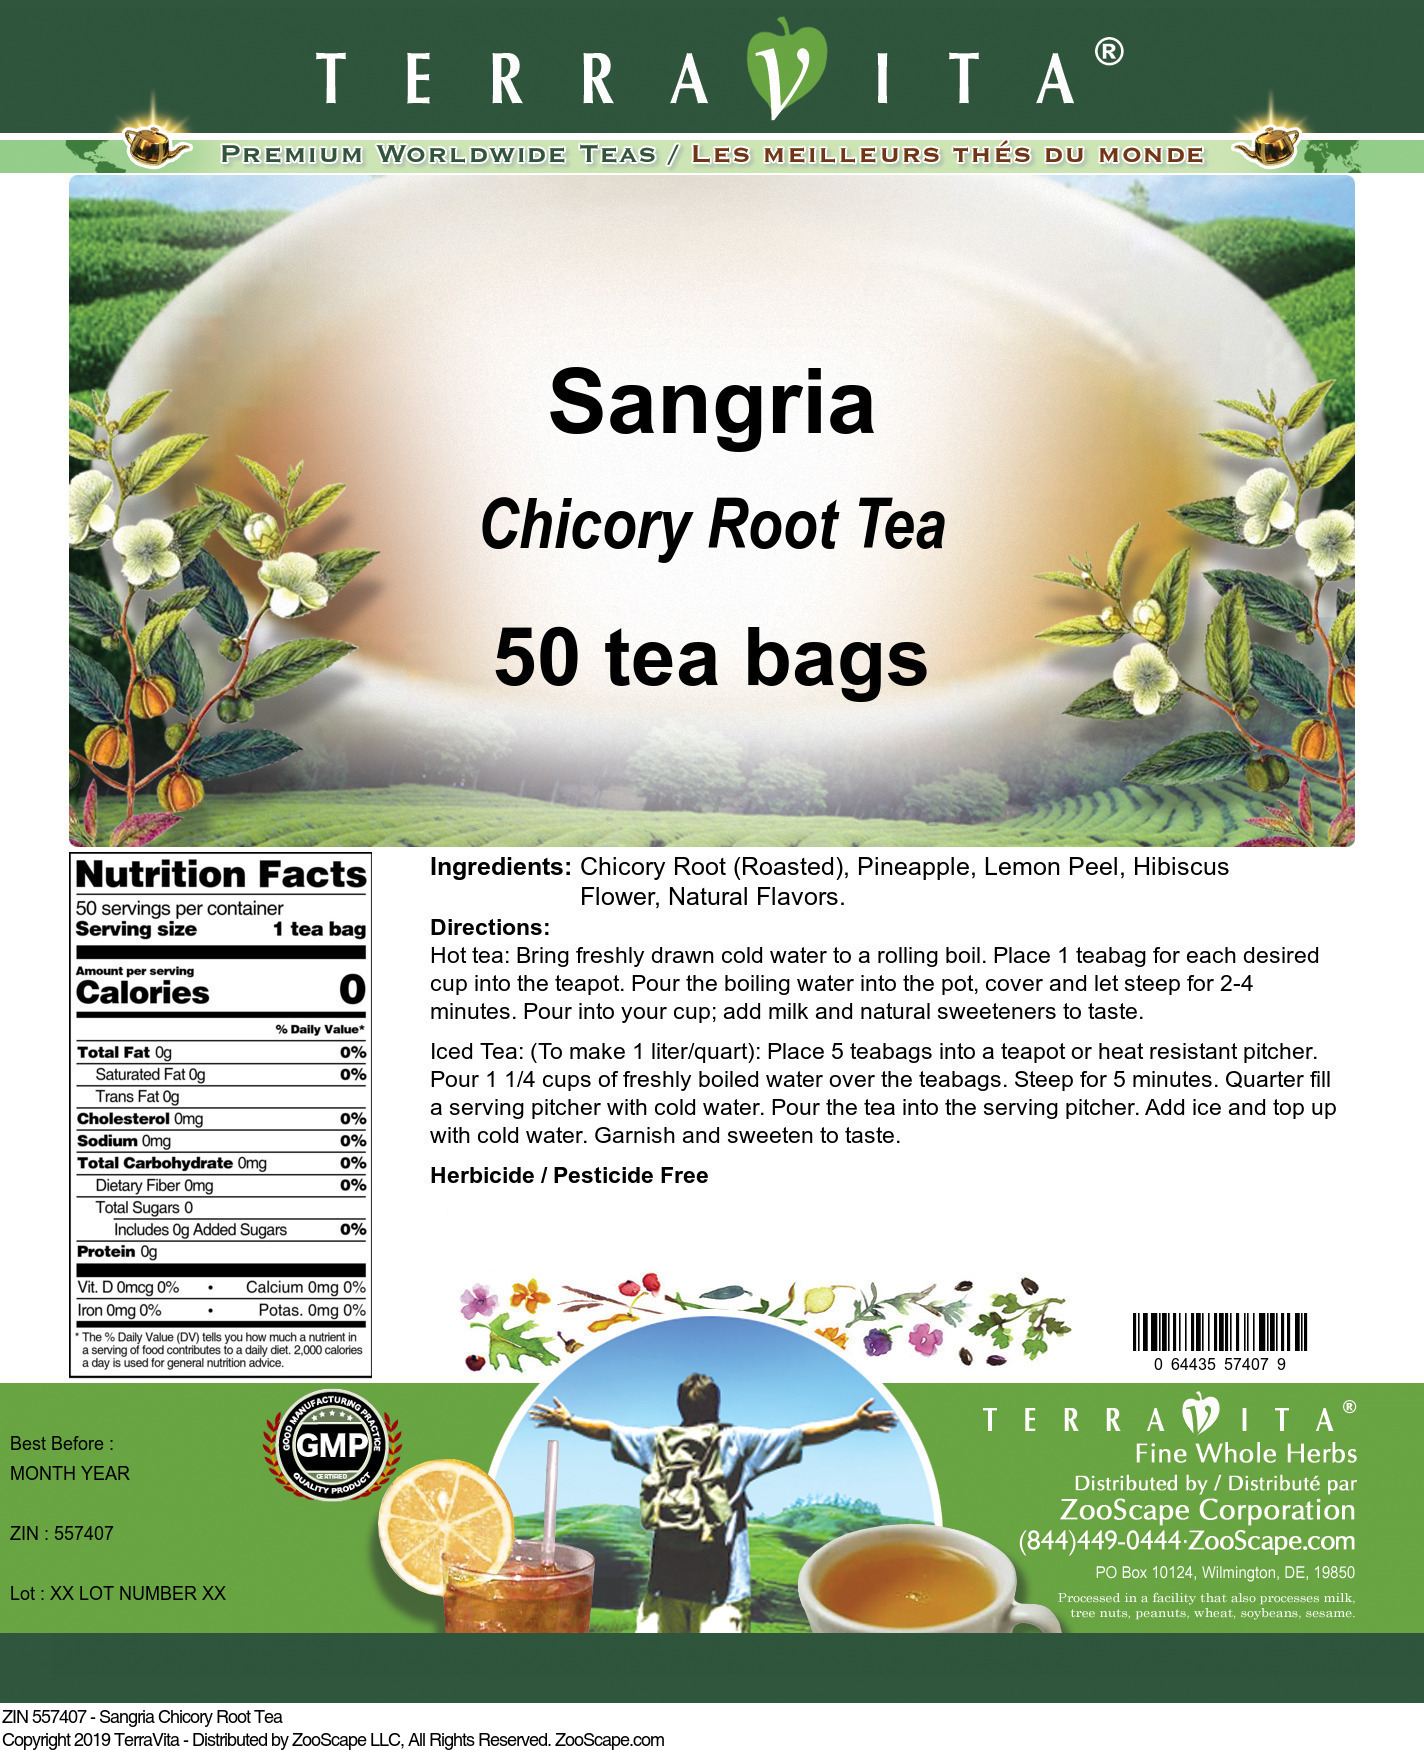 Sangria Chicory Root